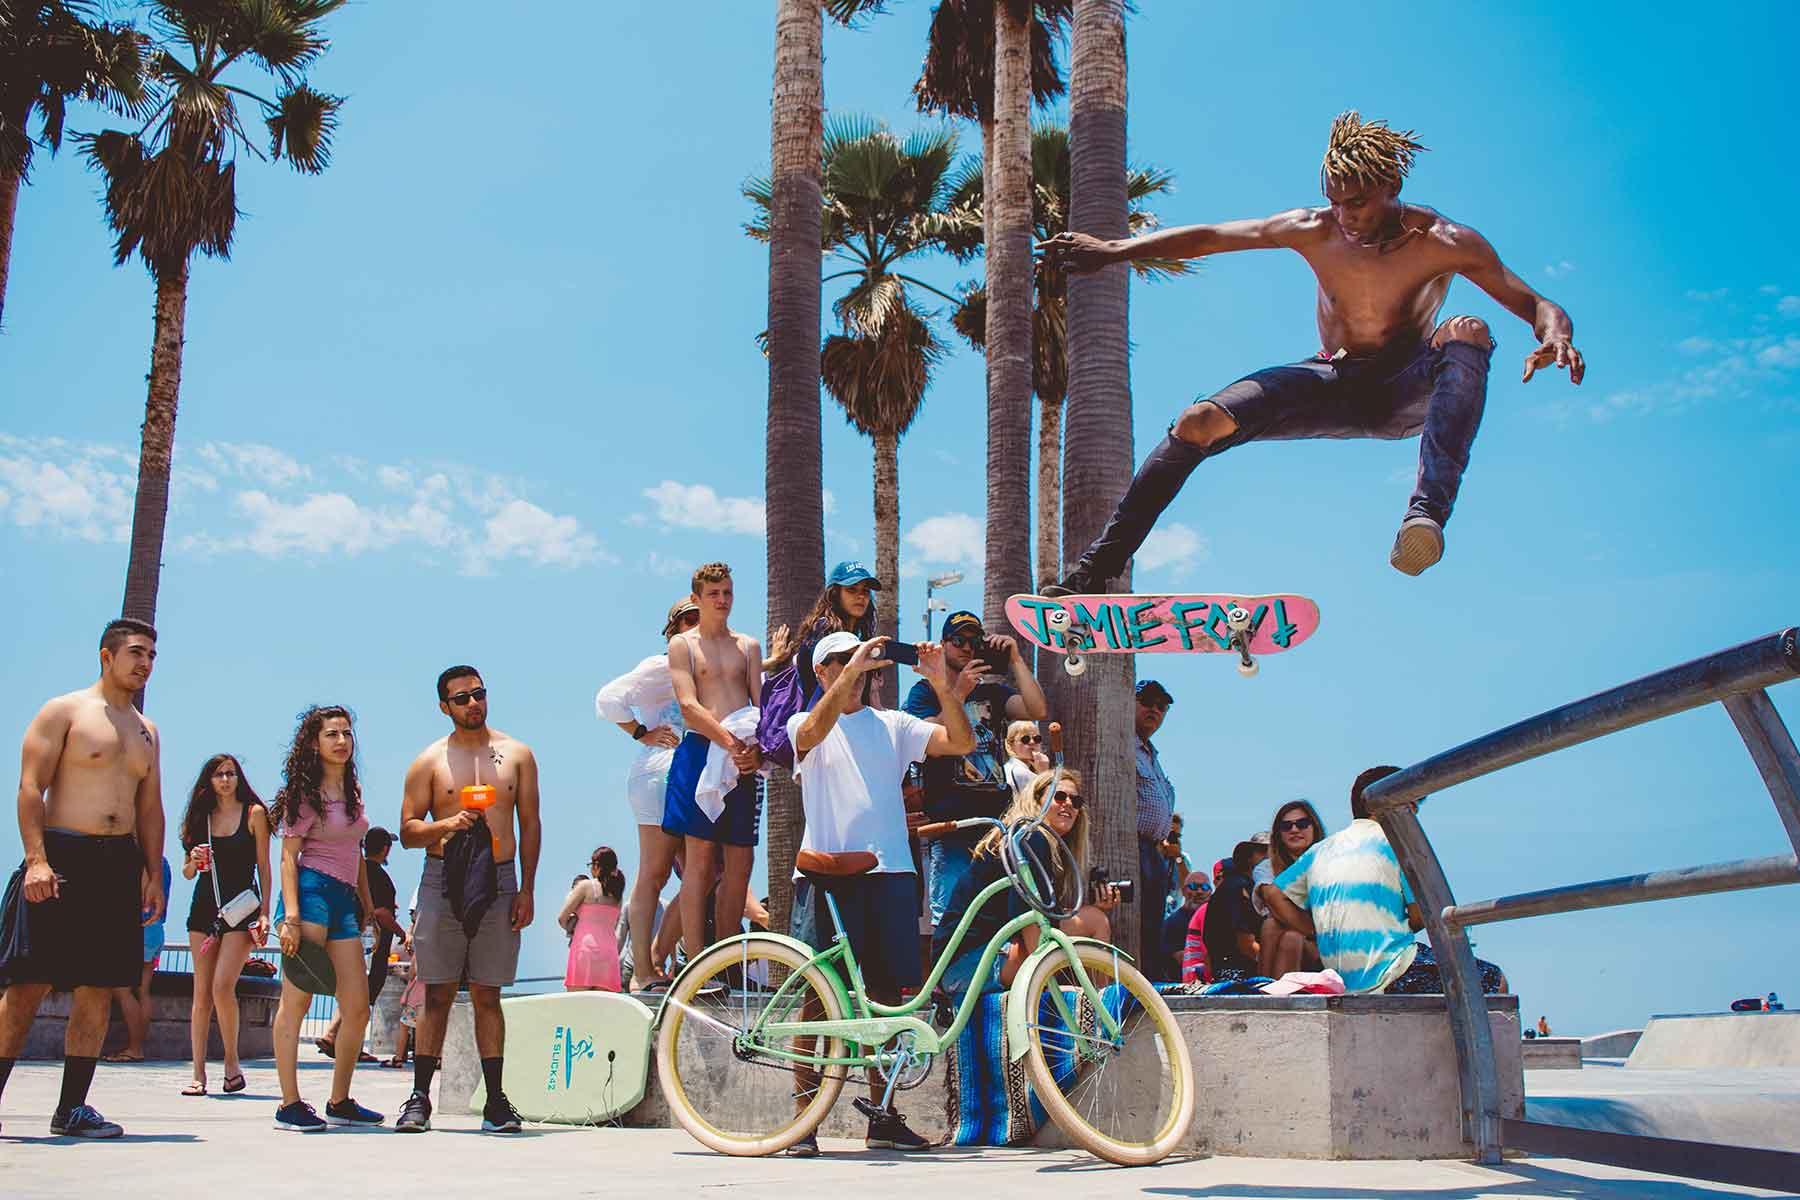 Resor-till-Kalifornien-med-Nygren-&-Lind-Resebyrå---venice-beach-skater2